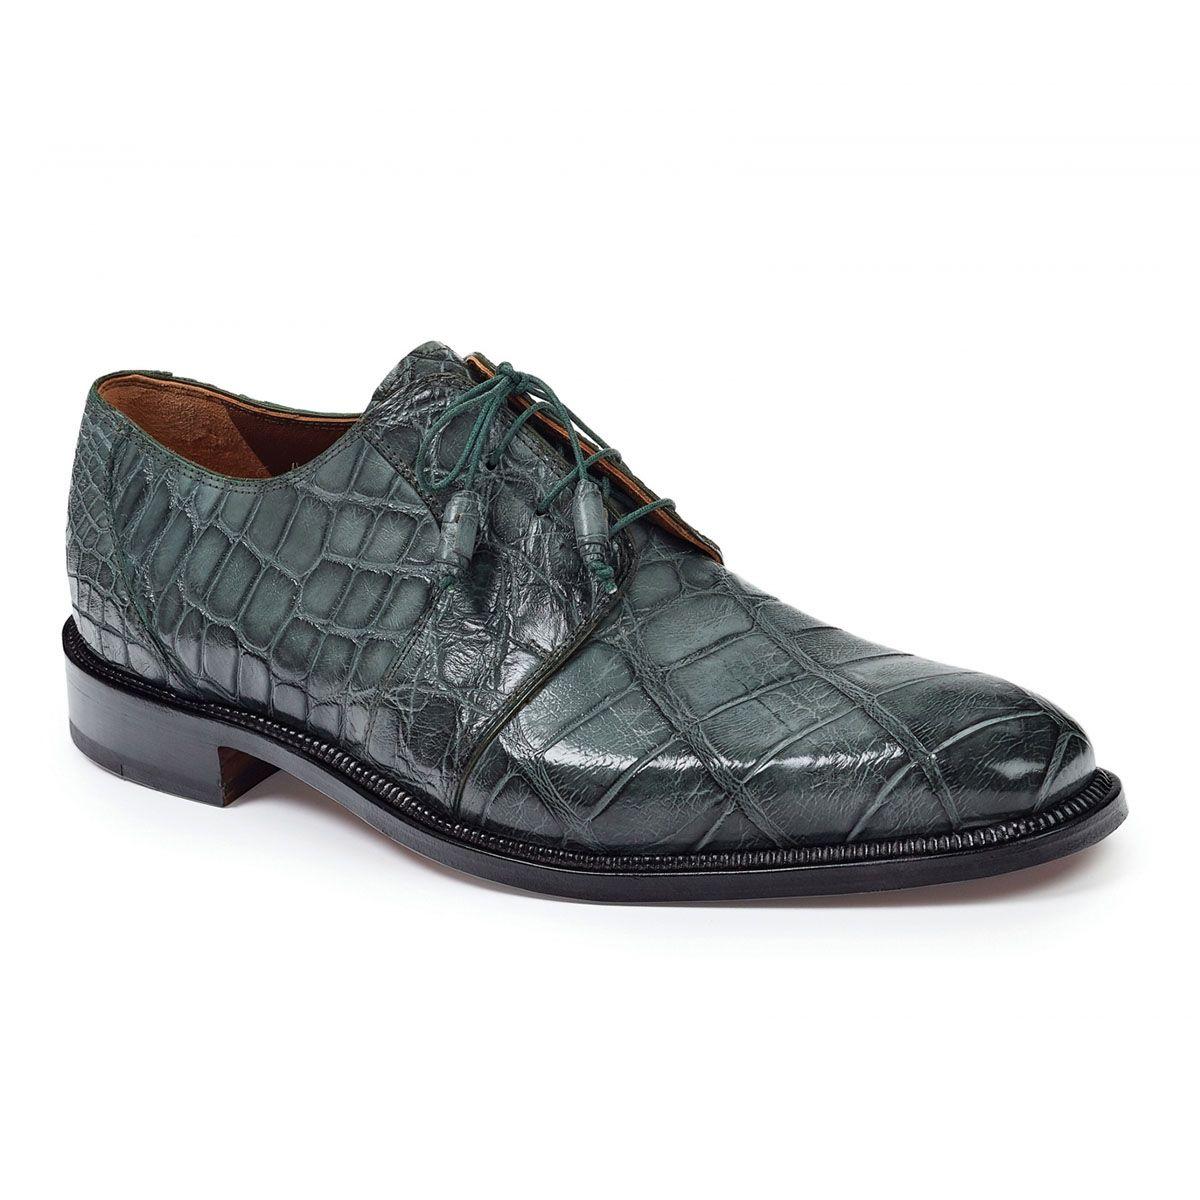 Fennix 3228 Alligator Skin Exotic Italian Shoes Grey Oxfords(FX2118) 32a7cf094d1